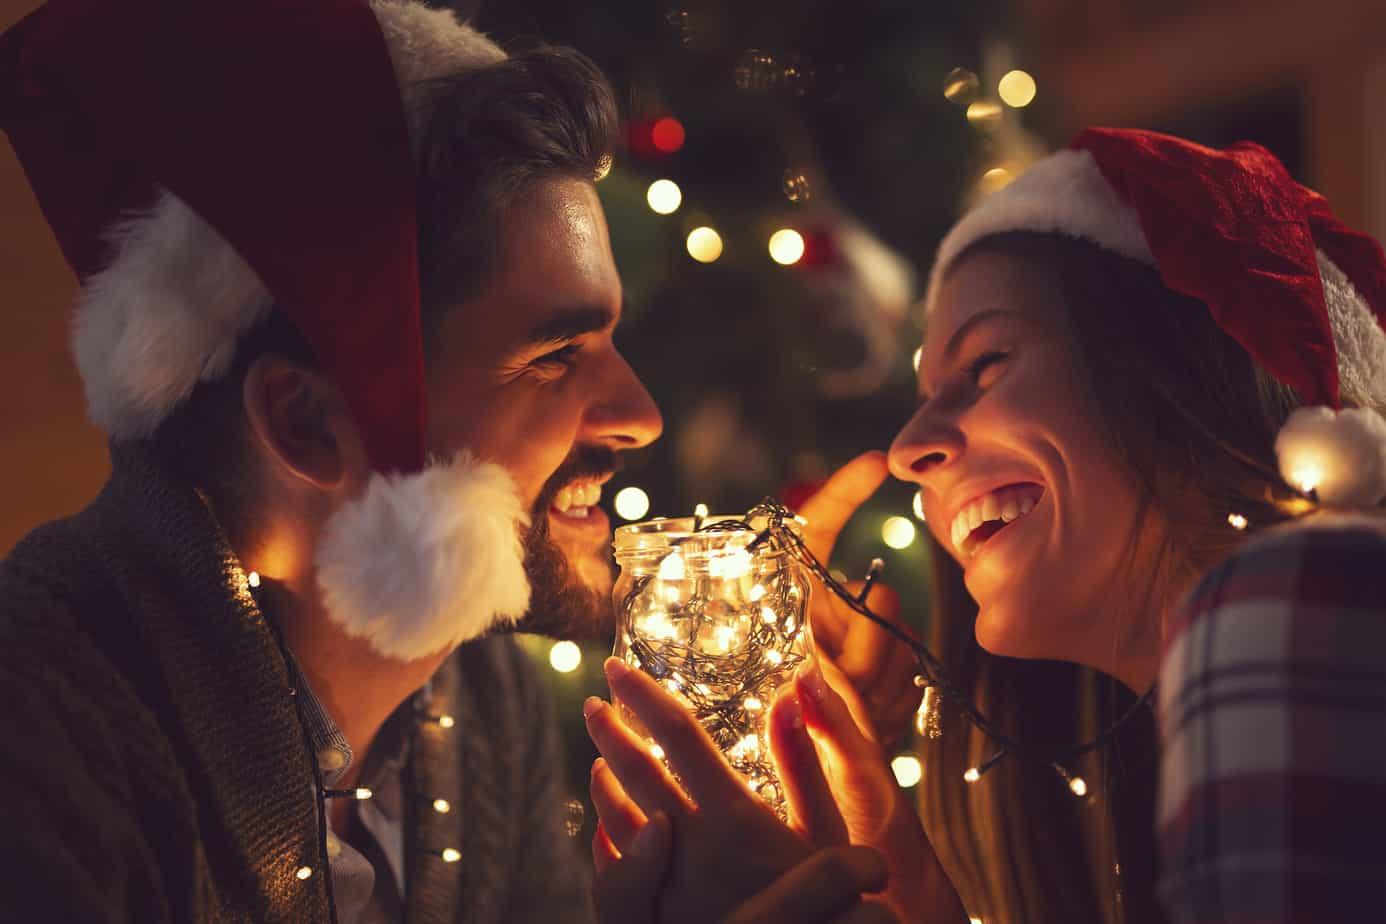 christmas-santa-hats-couple-tree-lights-wine-date-romance-holidays-winter-bigstock-young-couple-in-love-sitting-b-259825981